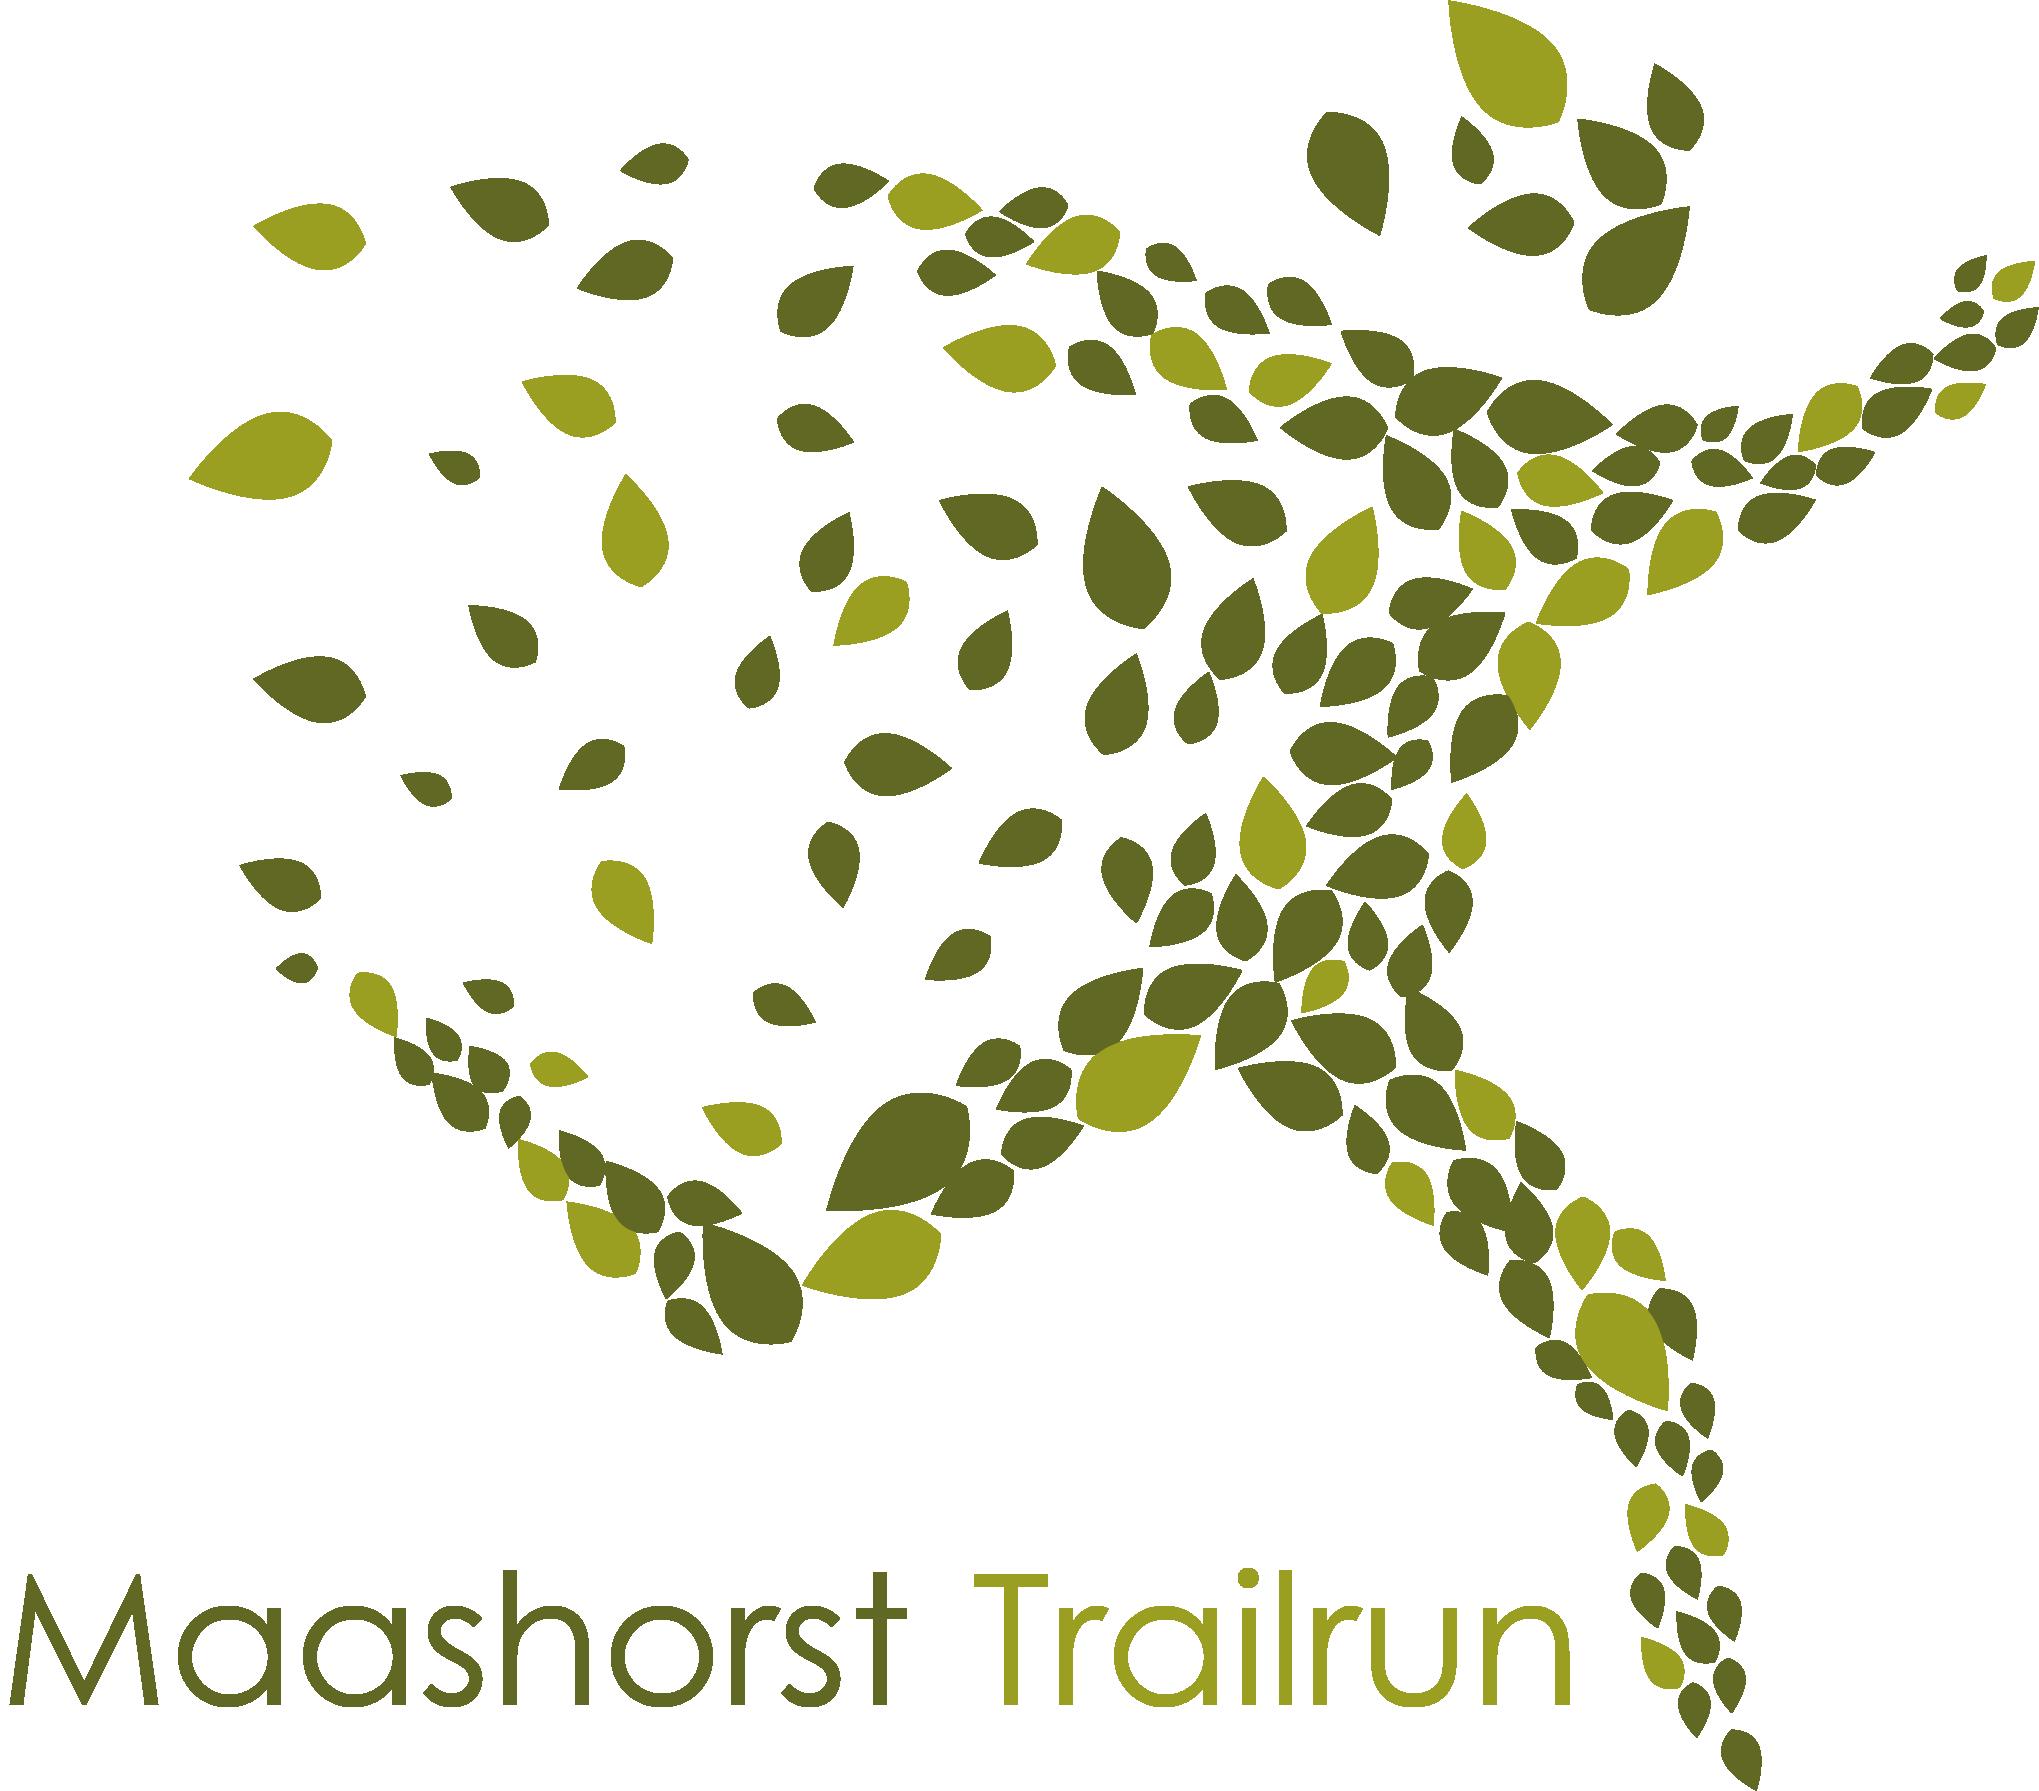 Maashort_Trail_Logo_Zonder_Tekst_Onder